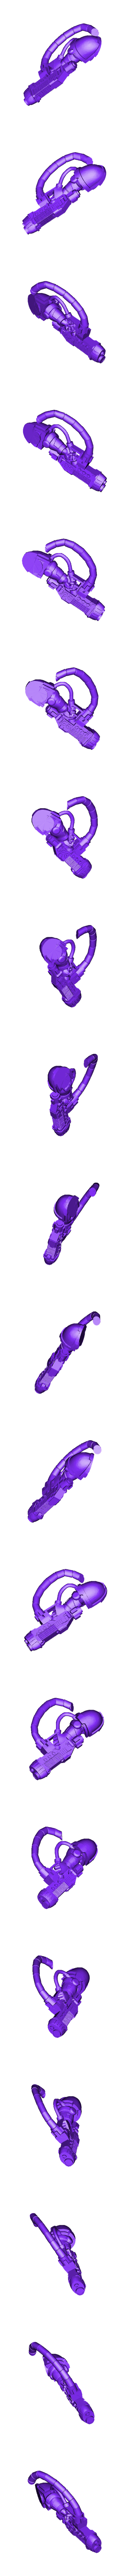 inceptor_right_arm.stl Download free STL file Inception of intercepting inceptors • 3D printer model, KarnageKing